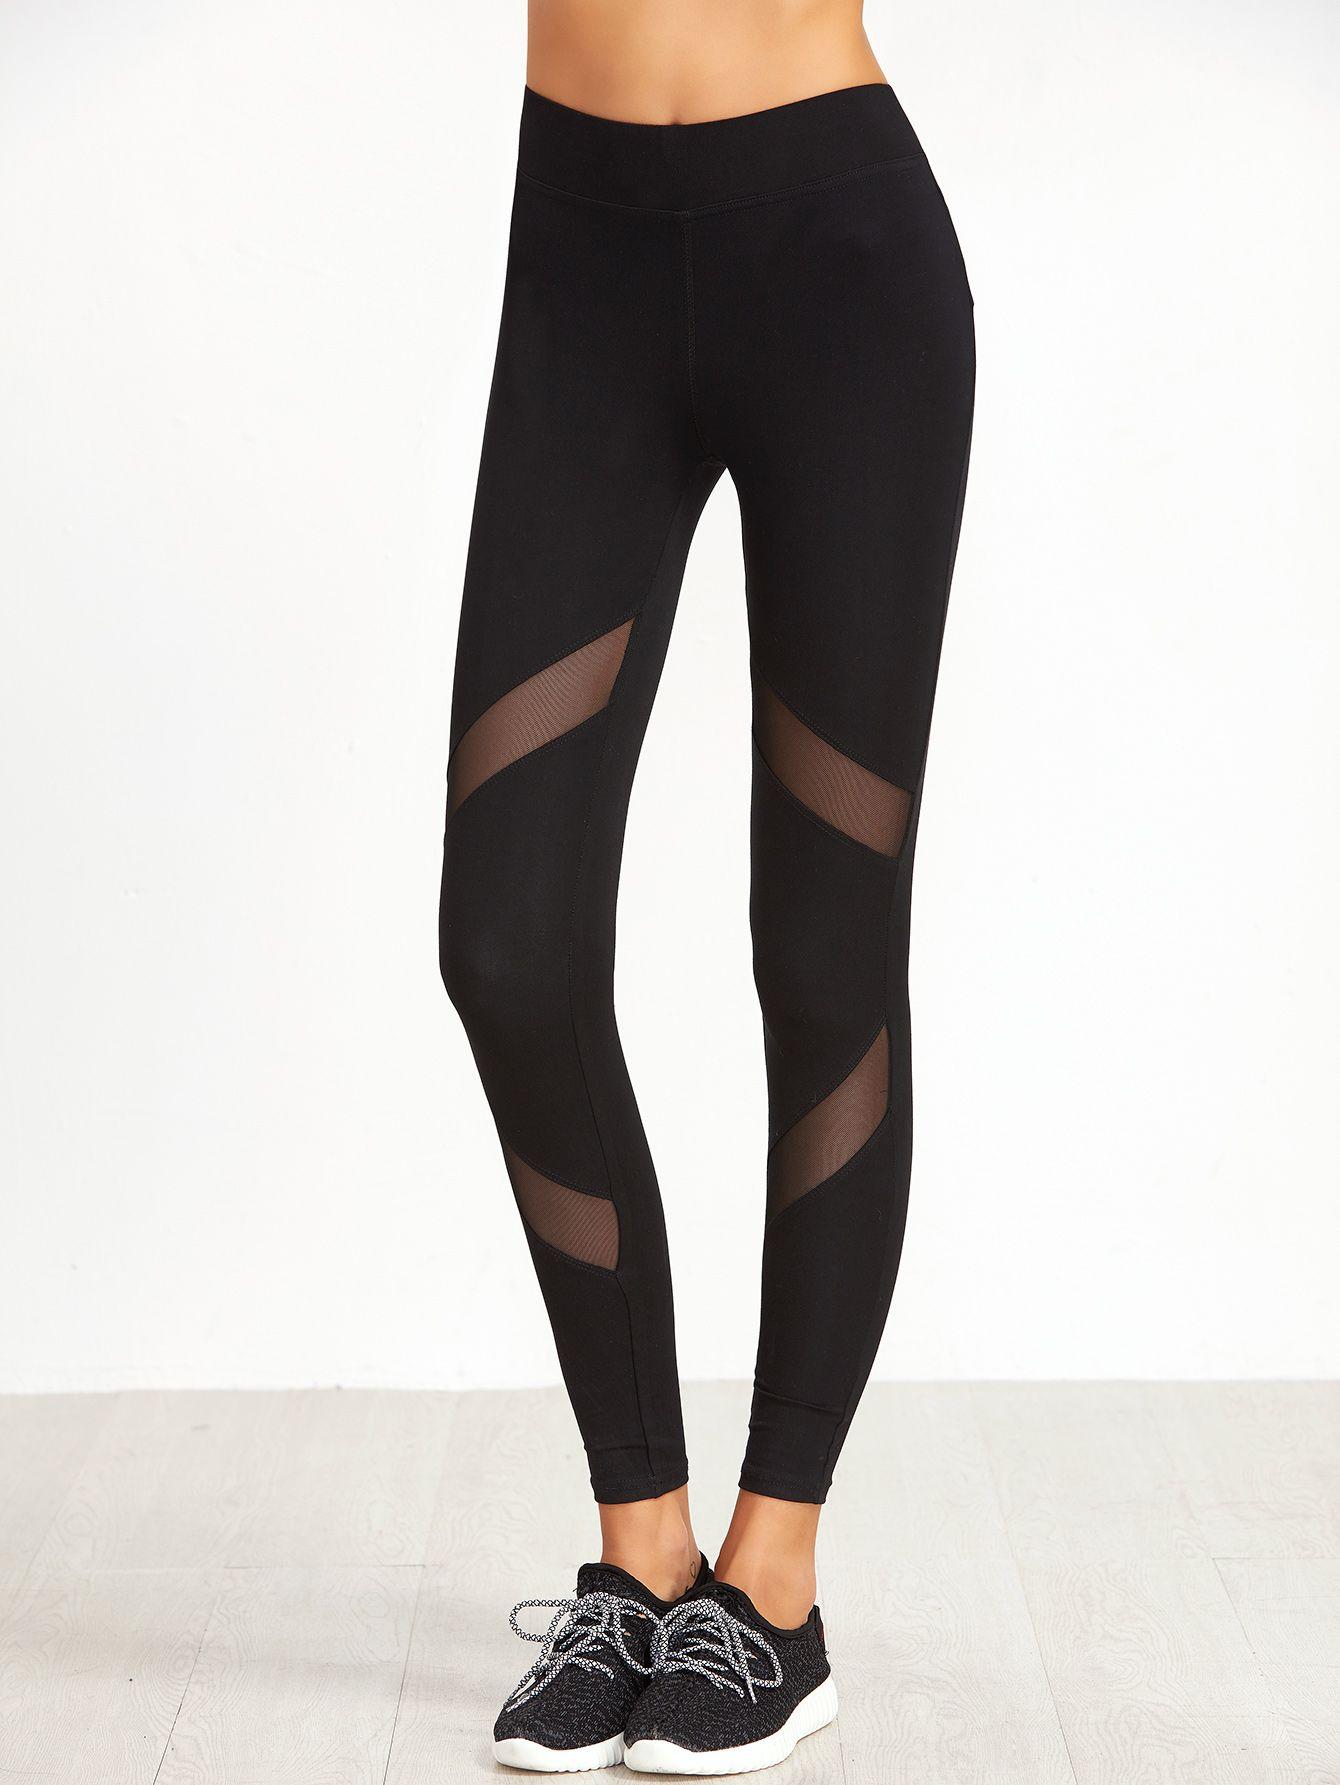 febd076b53ac9 Shop Black Mesh Insert Skinny Leggings online. SheIn offers Black Mesh  Insert Skinny Leggings &